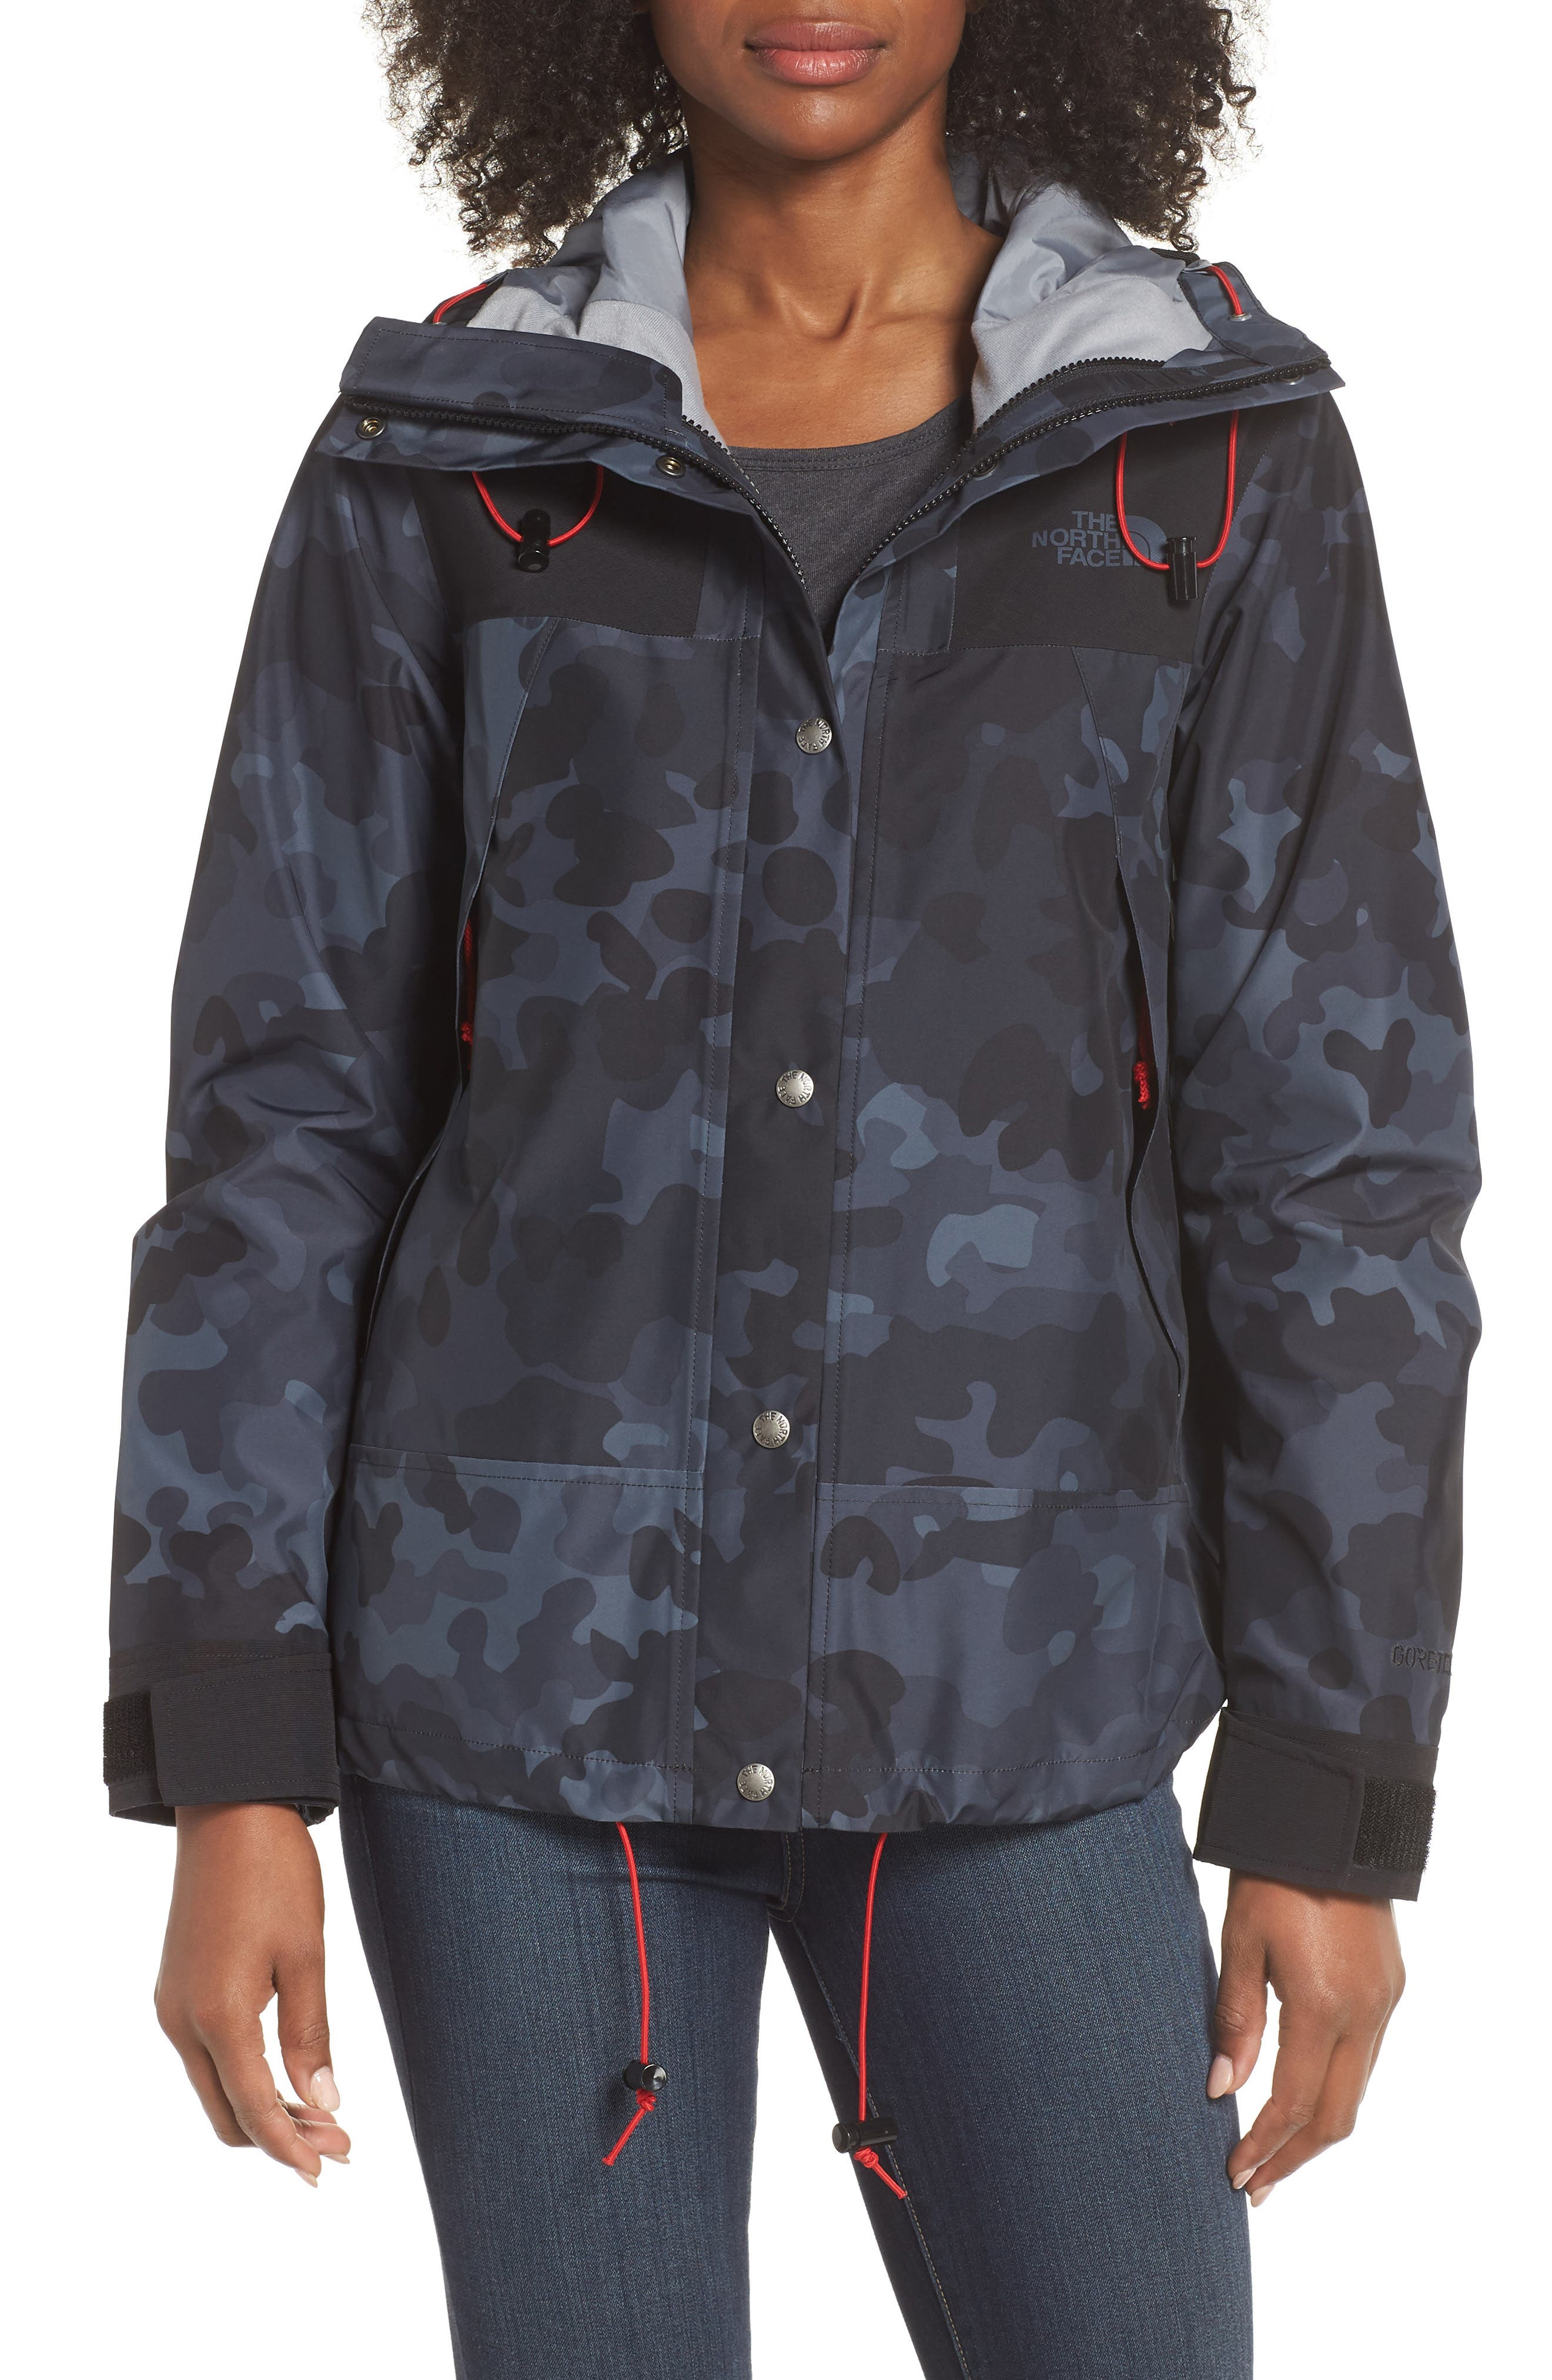 1990 Mountain Gore-Tex<sup>®</sup> Waterproof Jacket,                             Main thumbnail 1, color,                             TNF BLACK MACROFLECK PRINT